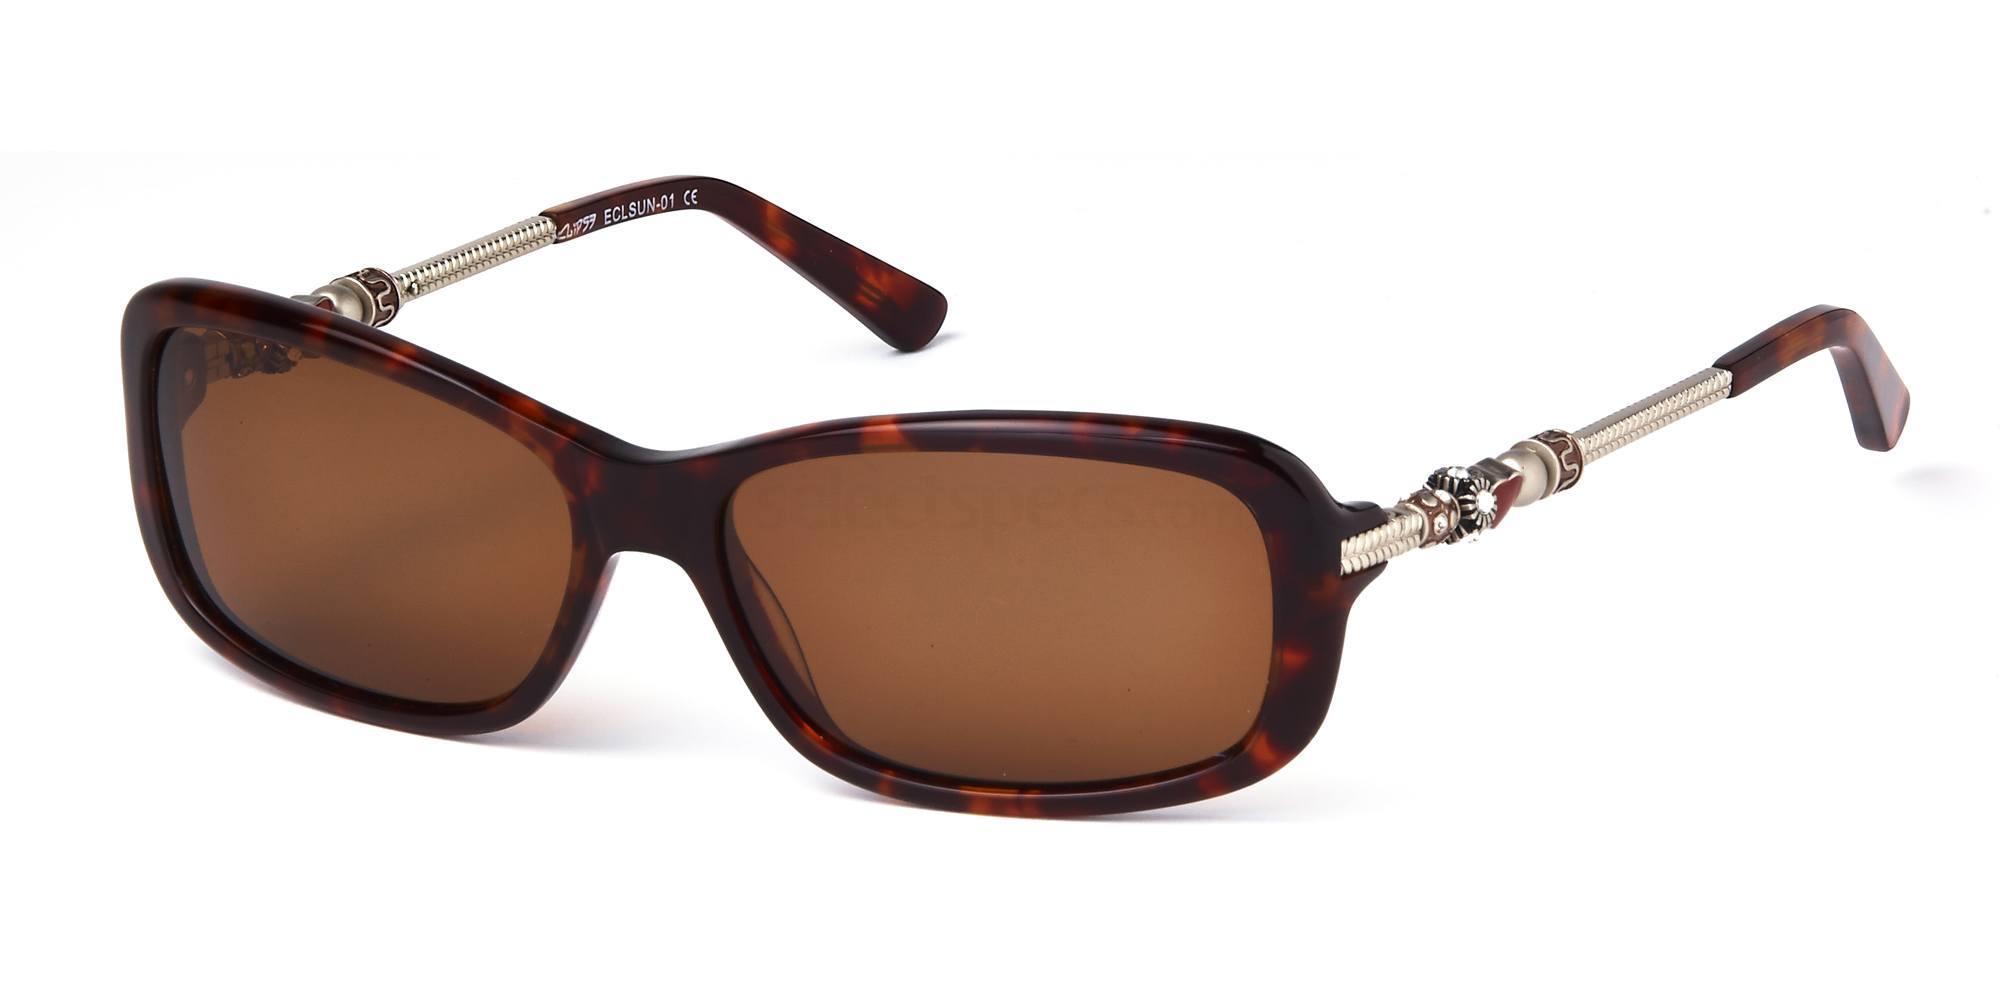 C2 ECLSUN01 Sunglasses, Eclipse